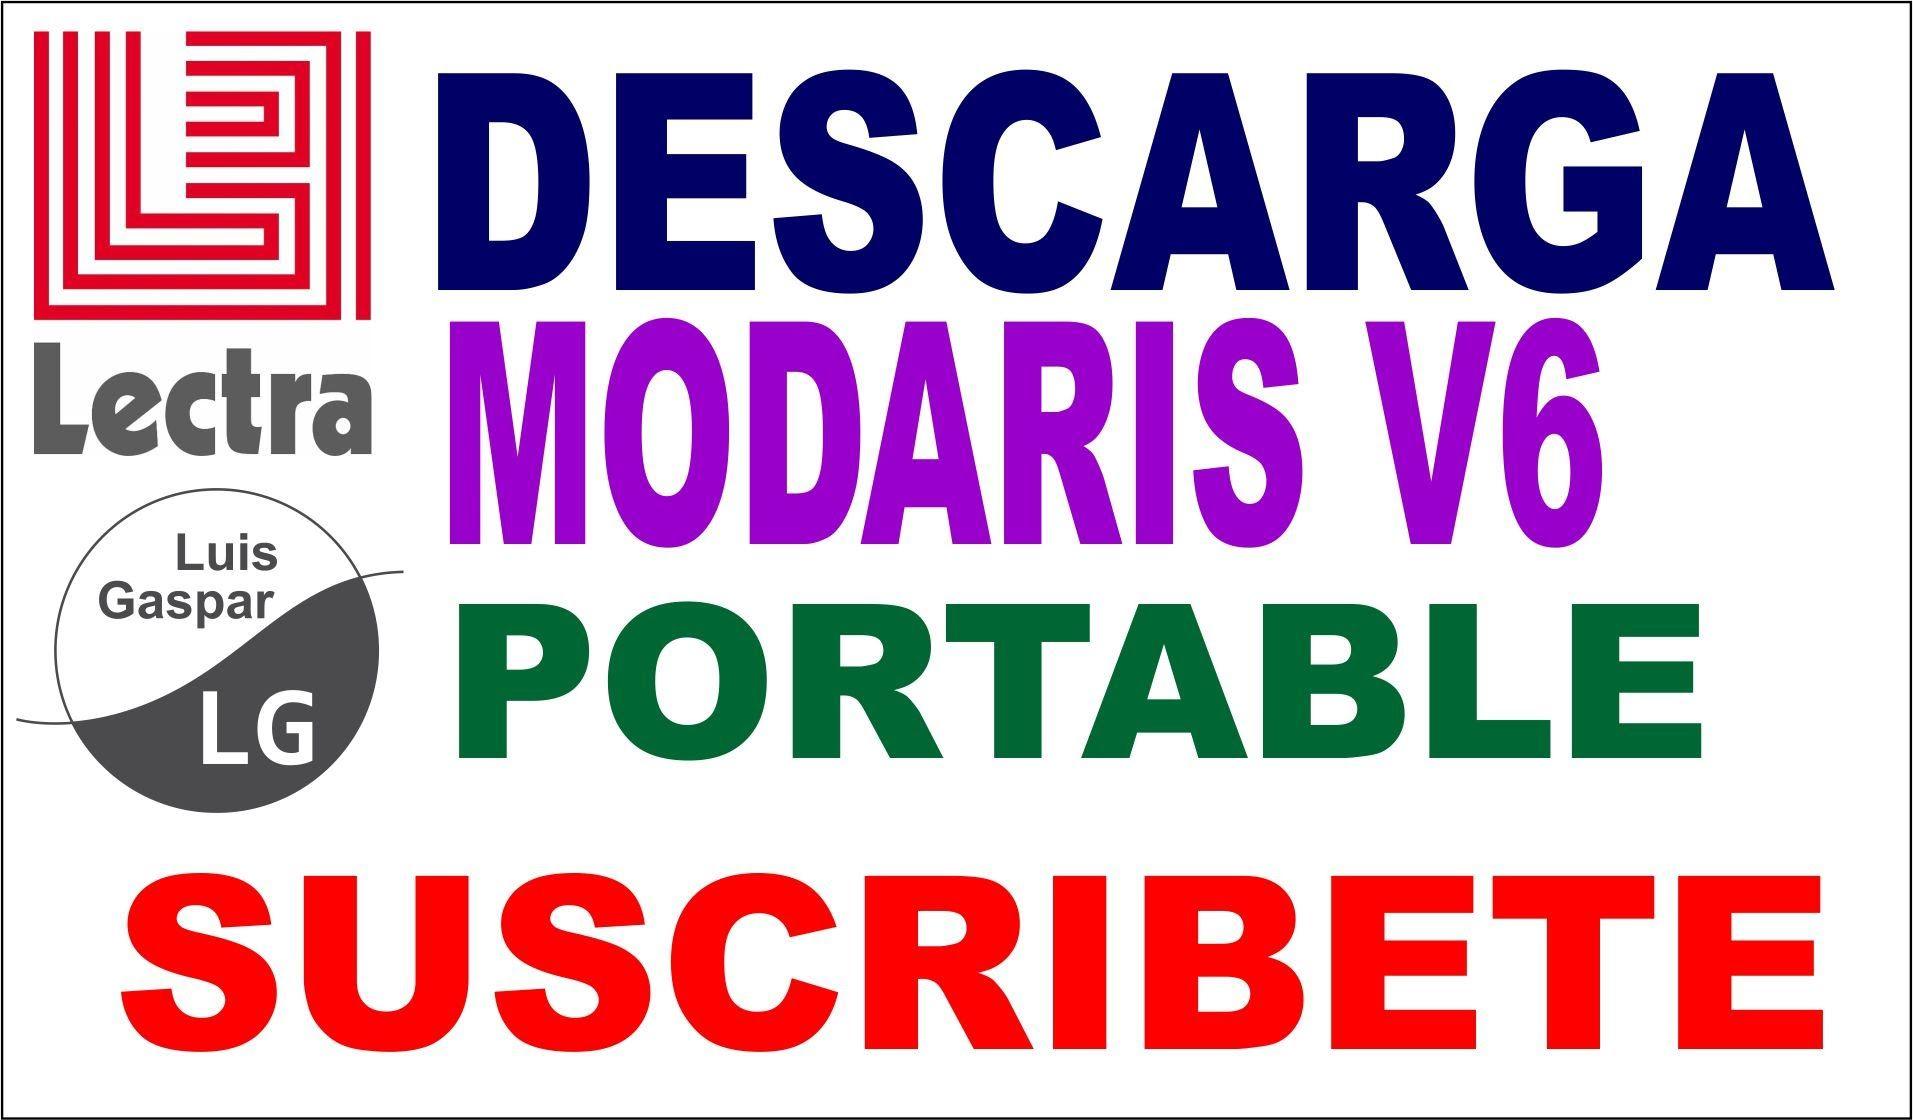 lectra modaris v7 download